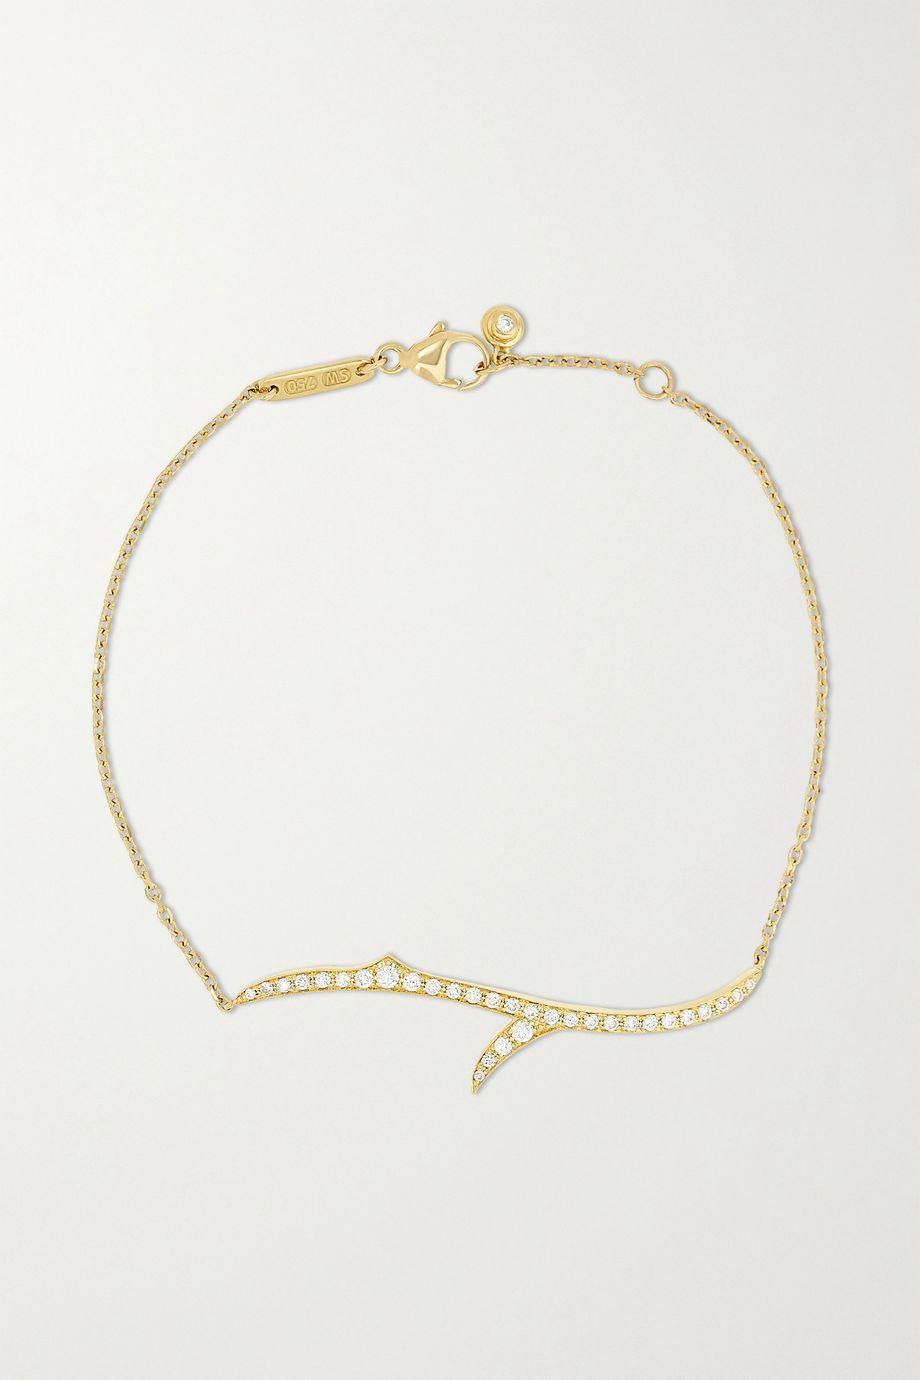 Stephen Webster + NET SUSTAIN Thorn Stem 18-karat recycled gold diamond bracelet